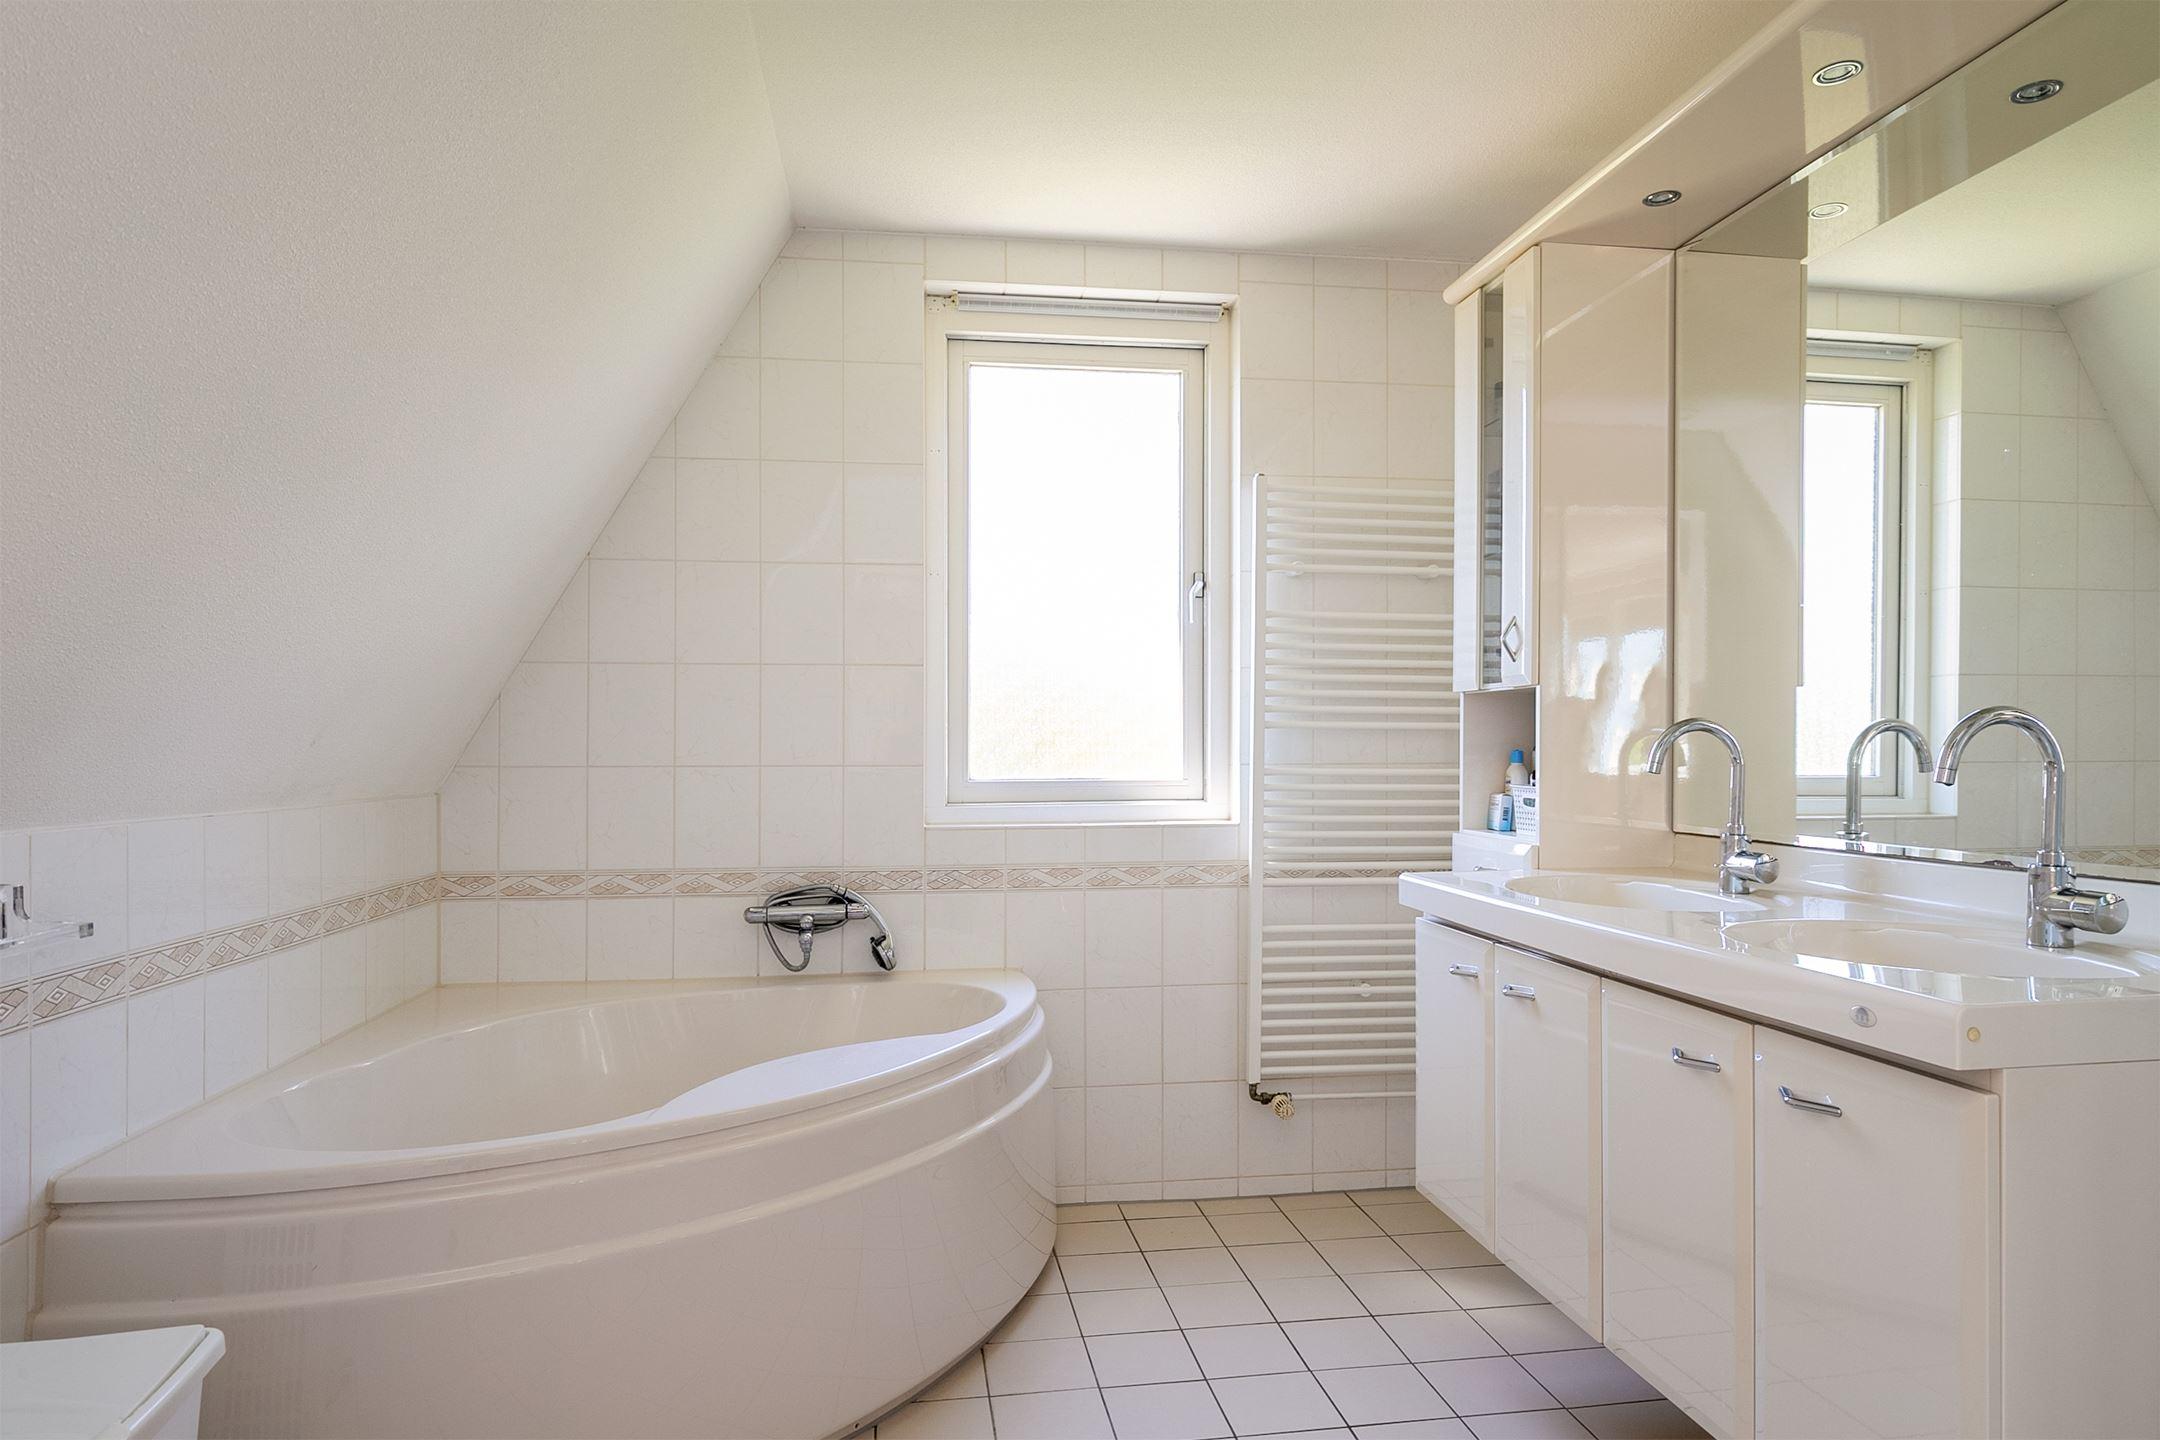 Huis te koop: Ringvaartpark 43 2907 LH Capelle aan den IJssel [funda]